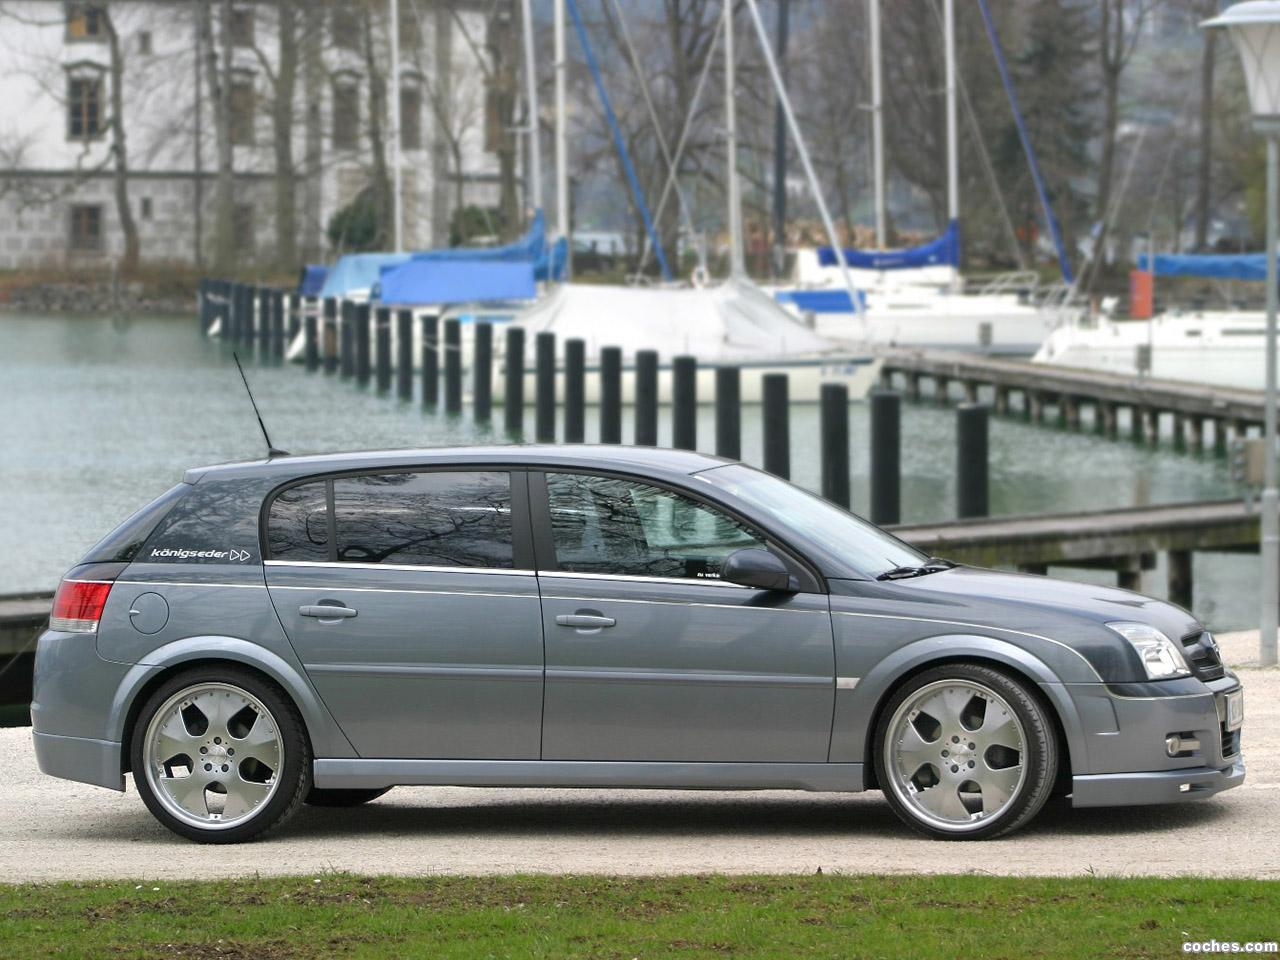 Foto 0 de Konigseder Opel Signum 2010